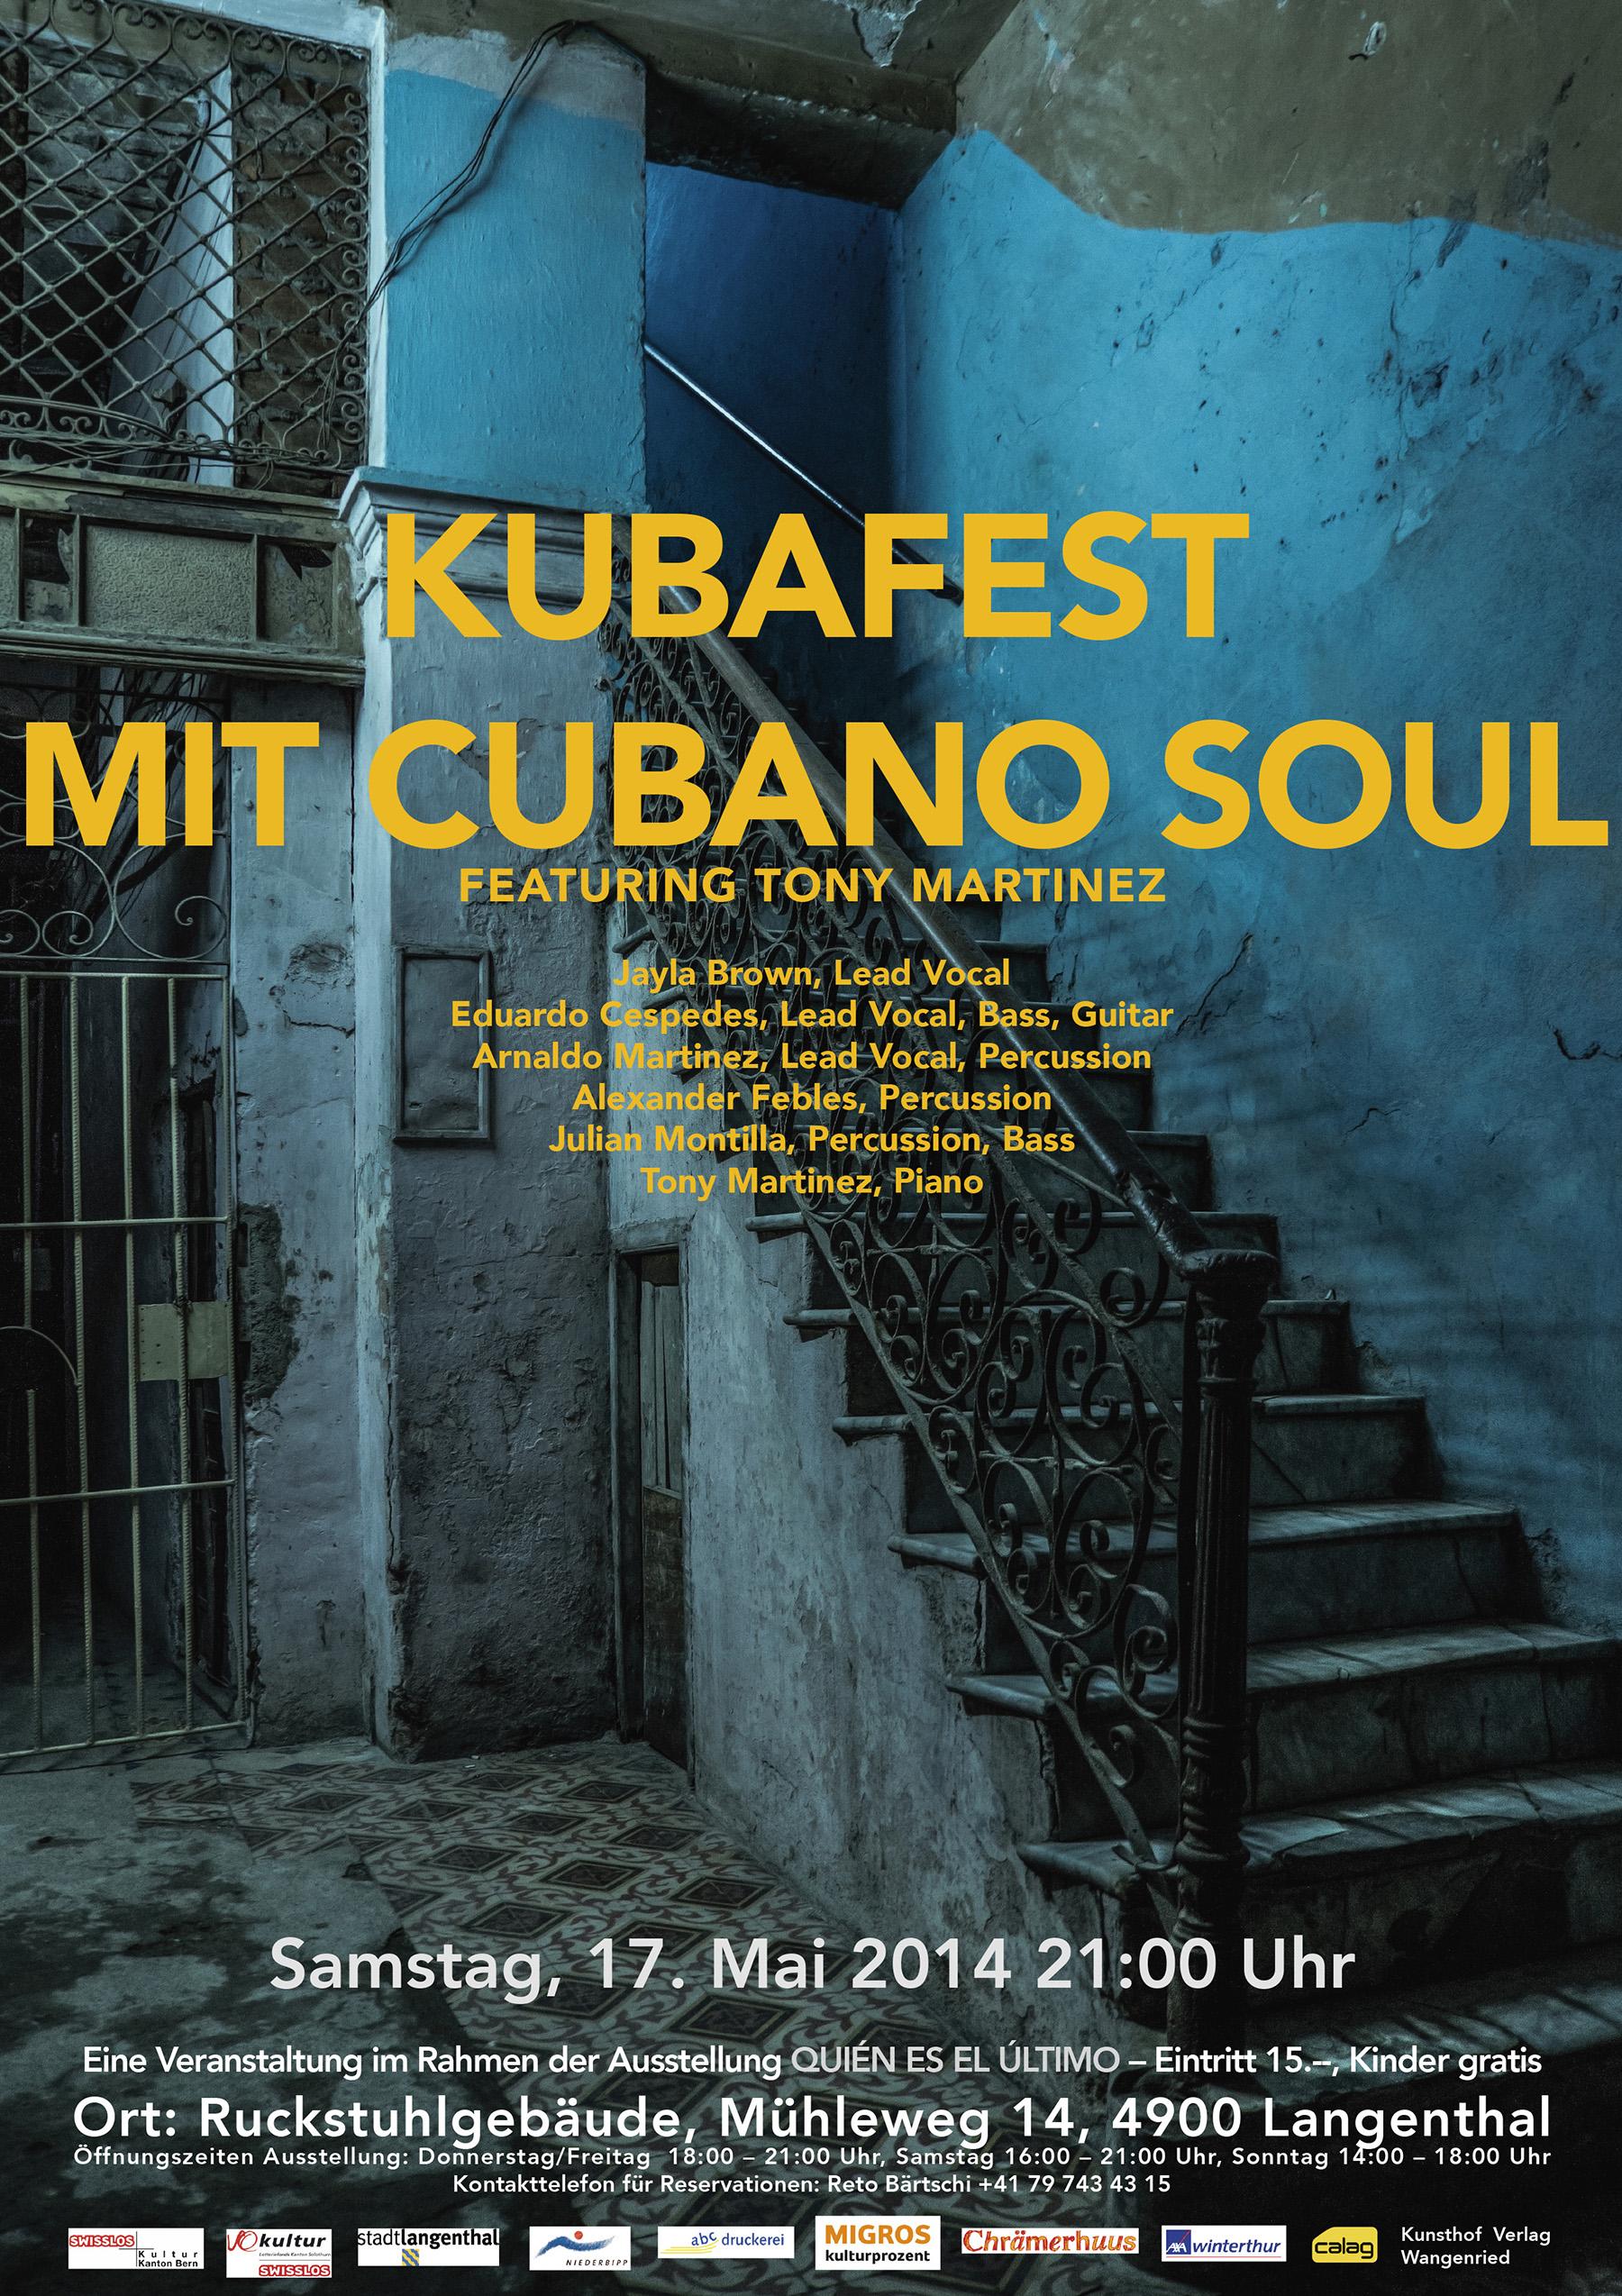 2_Kubafest mit Cubano Soul.jpg